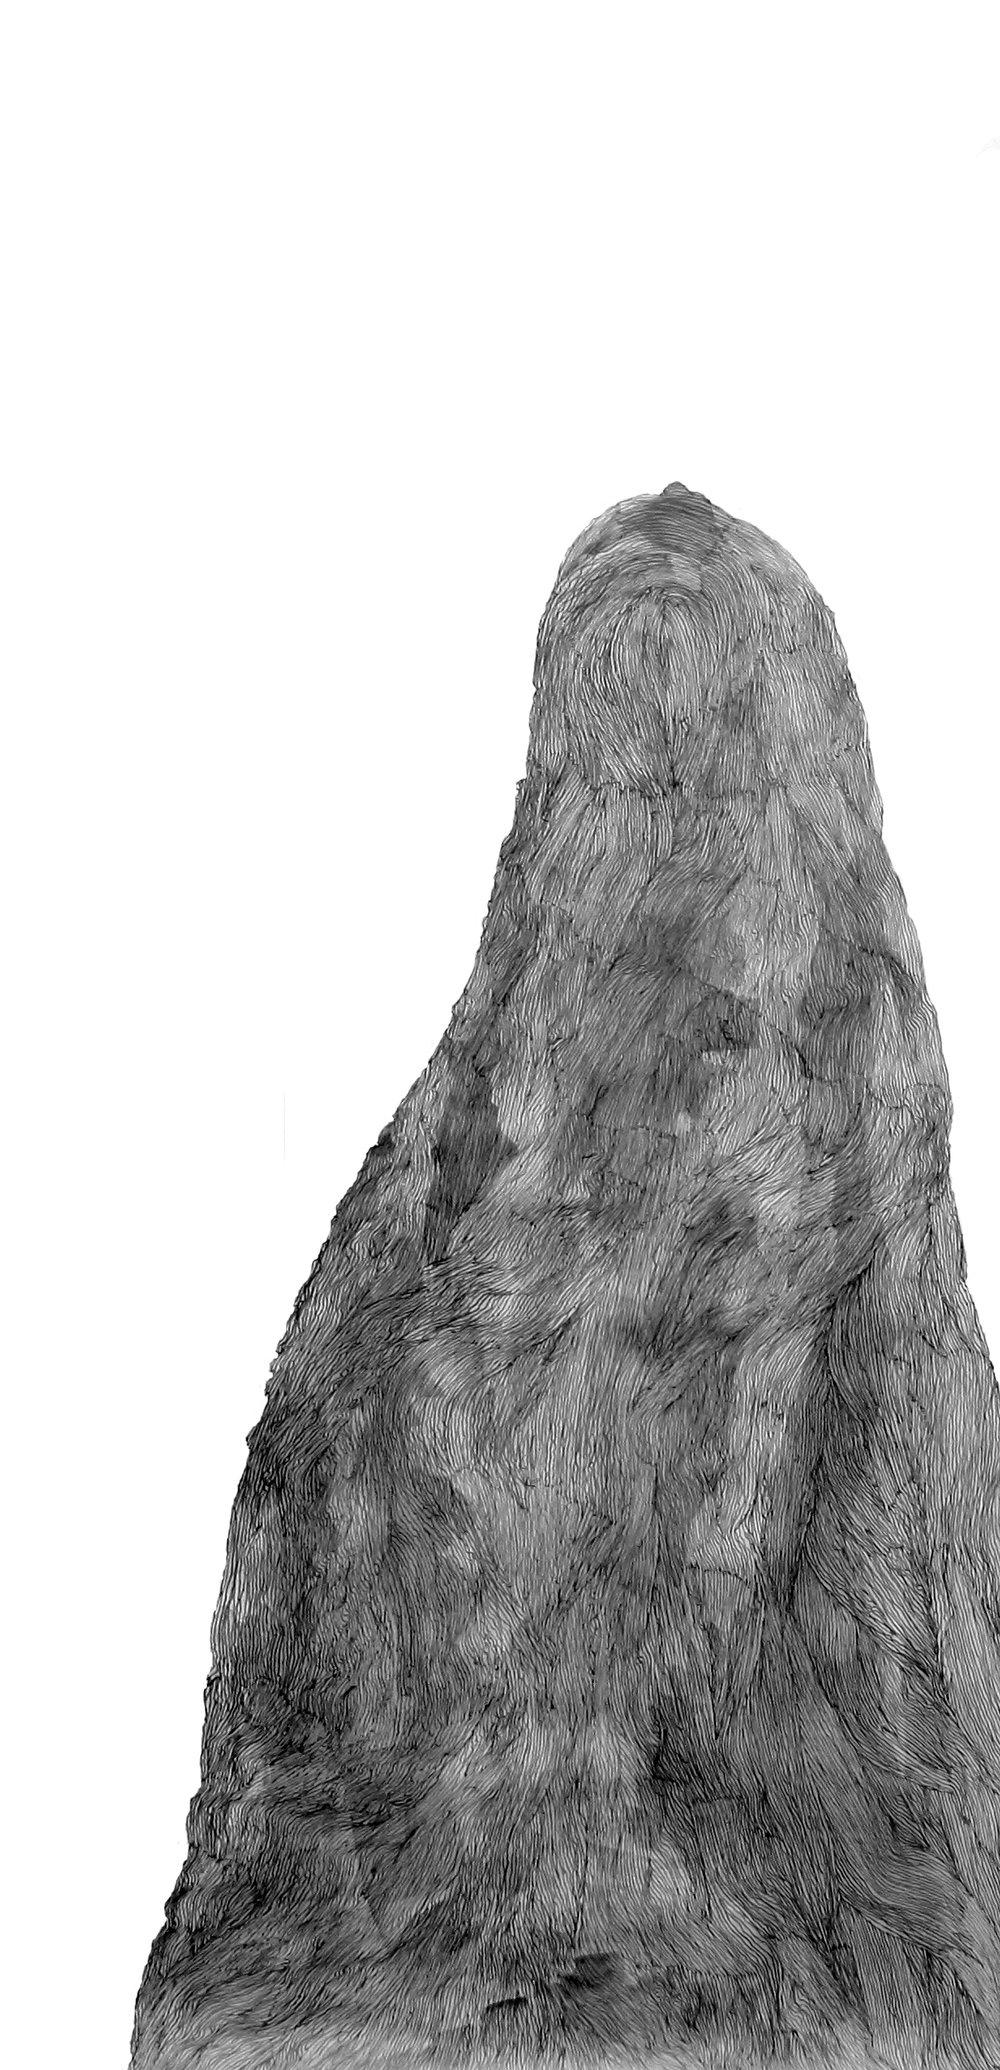 Fur Mountain ,Pencil on paper, 150 x 68 cm, 2017